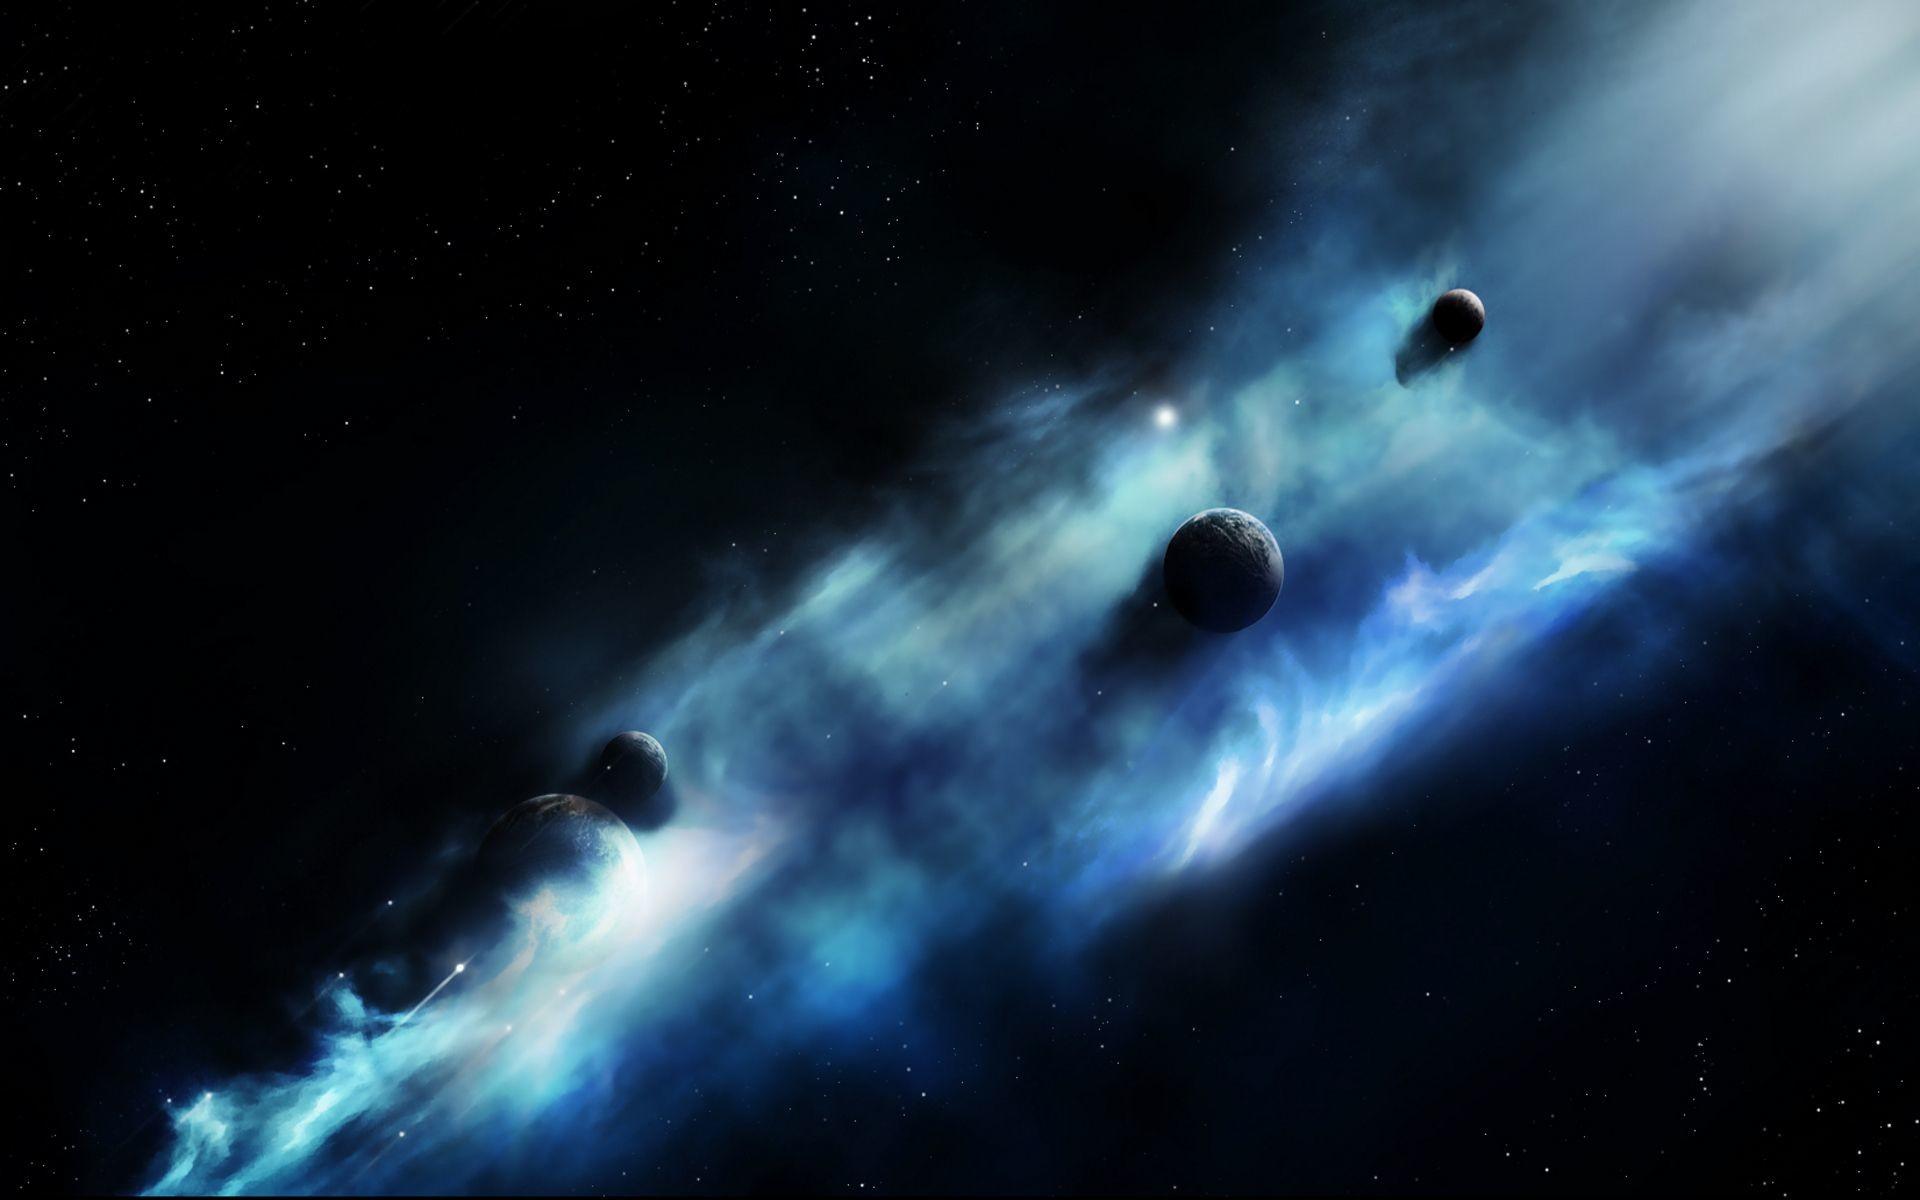 Star Space Wallpaper